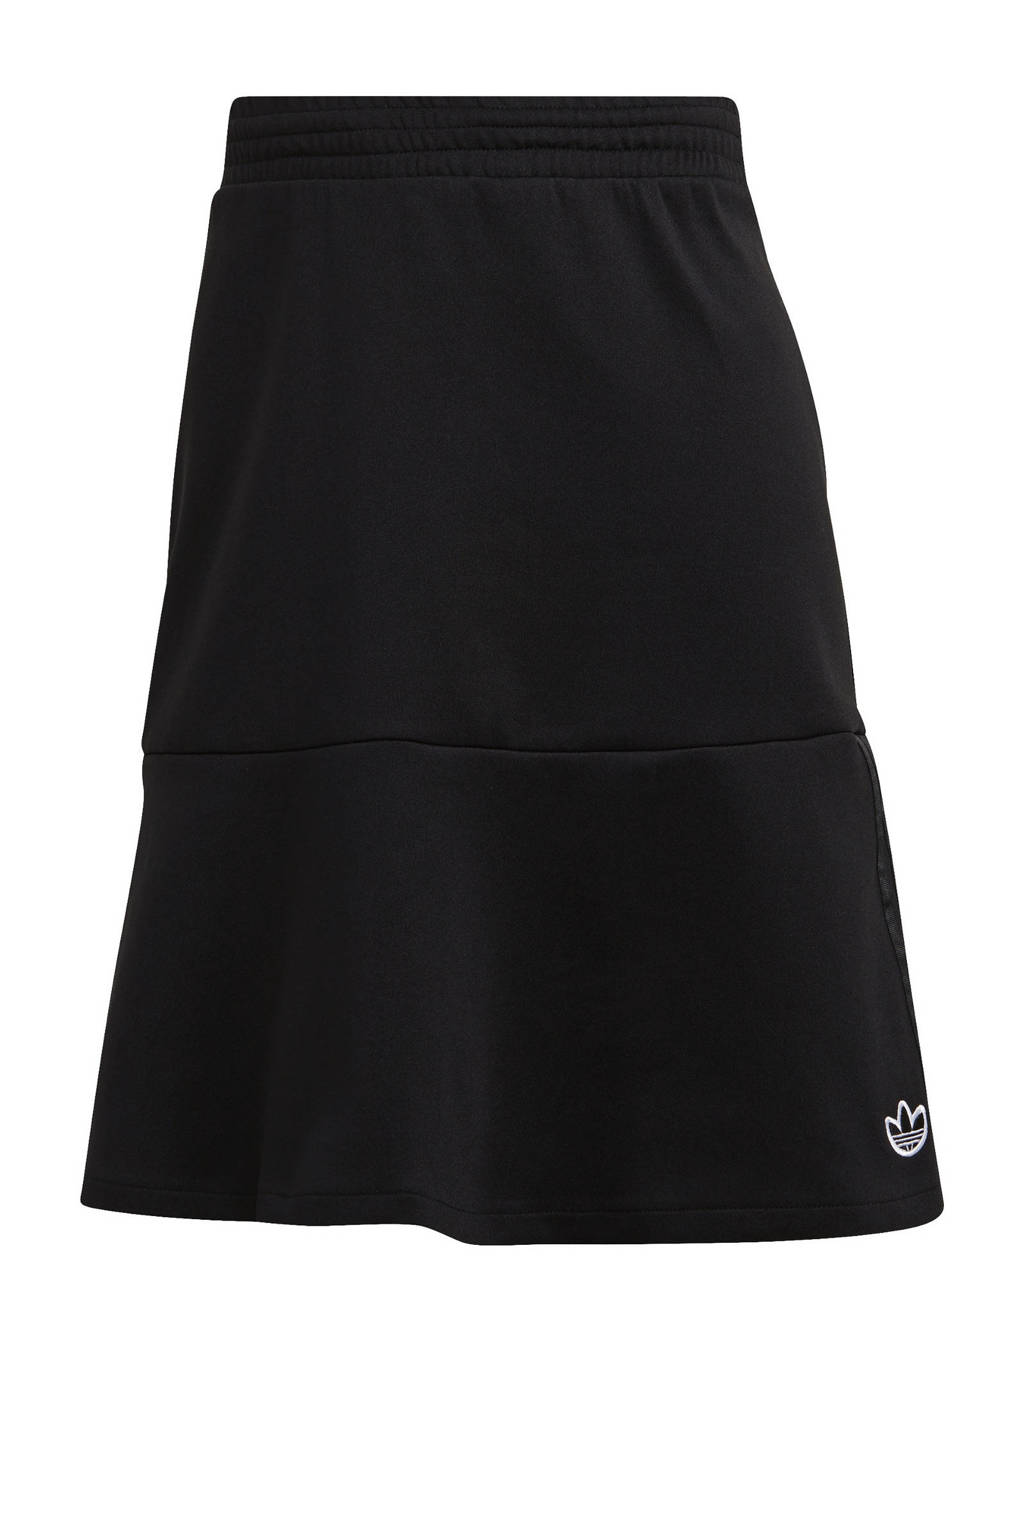 adidas Originals Bellista rok zwart, Zwart